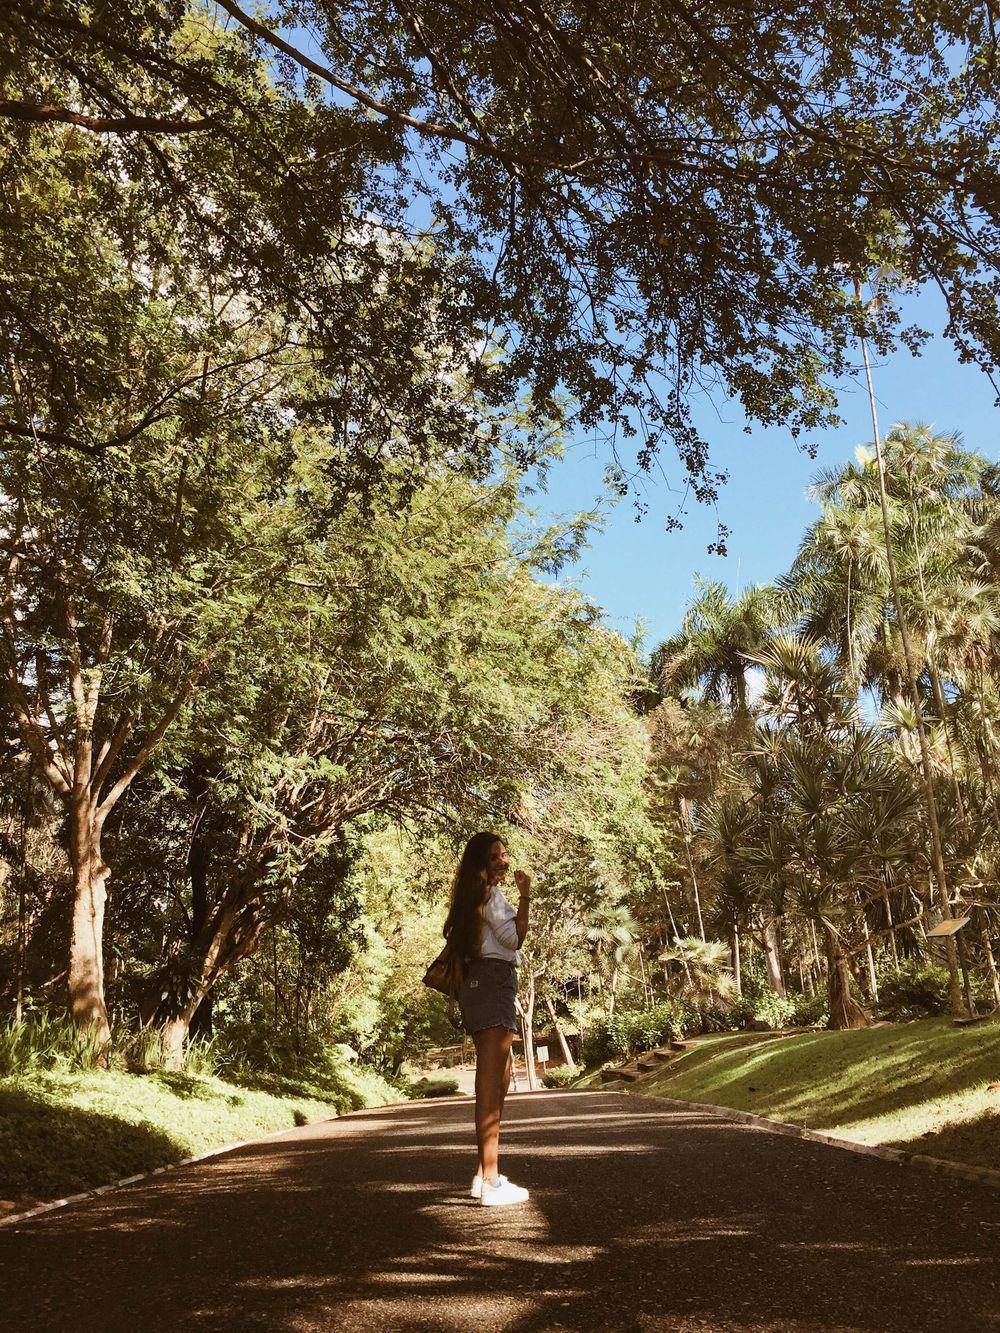 National Botanical Garden - image 2 - student project